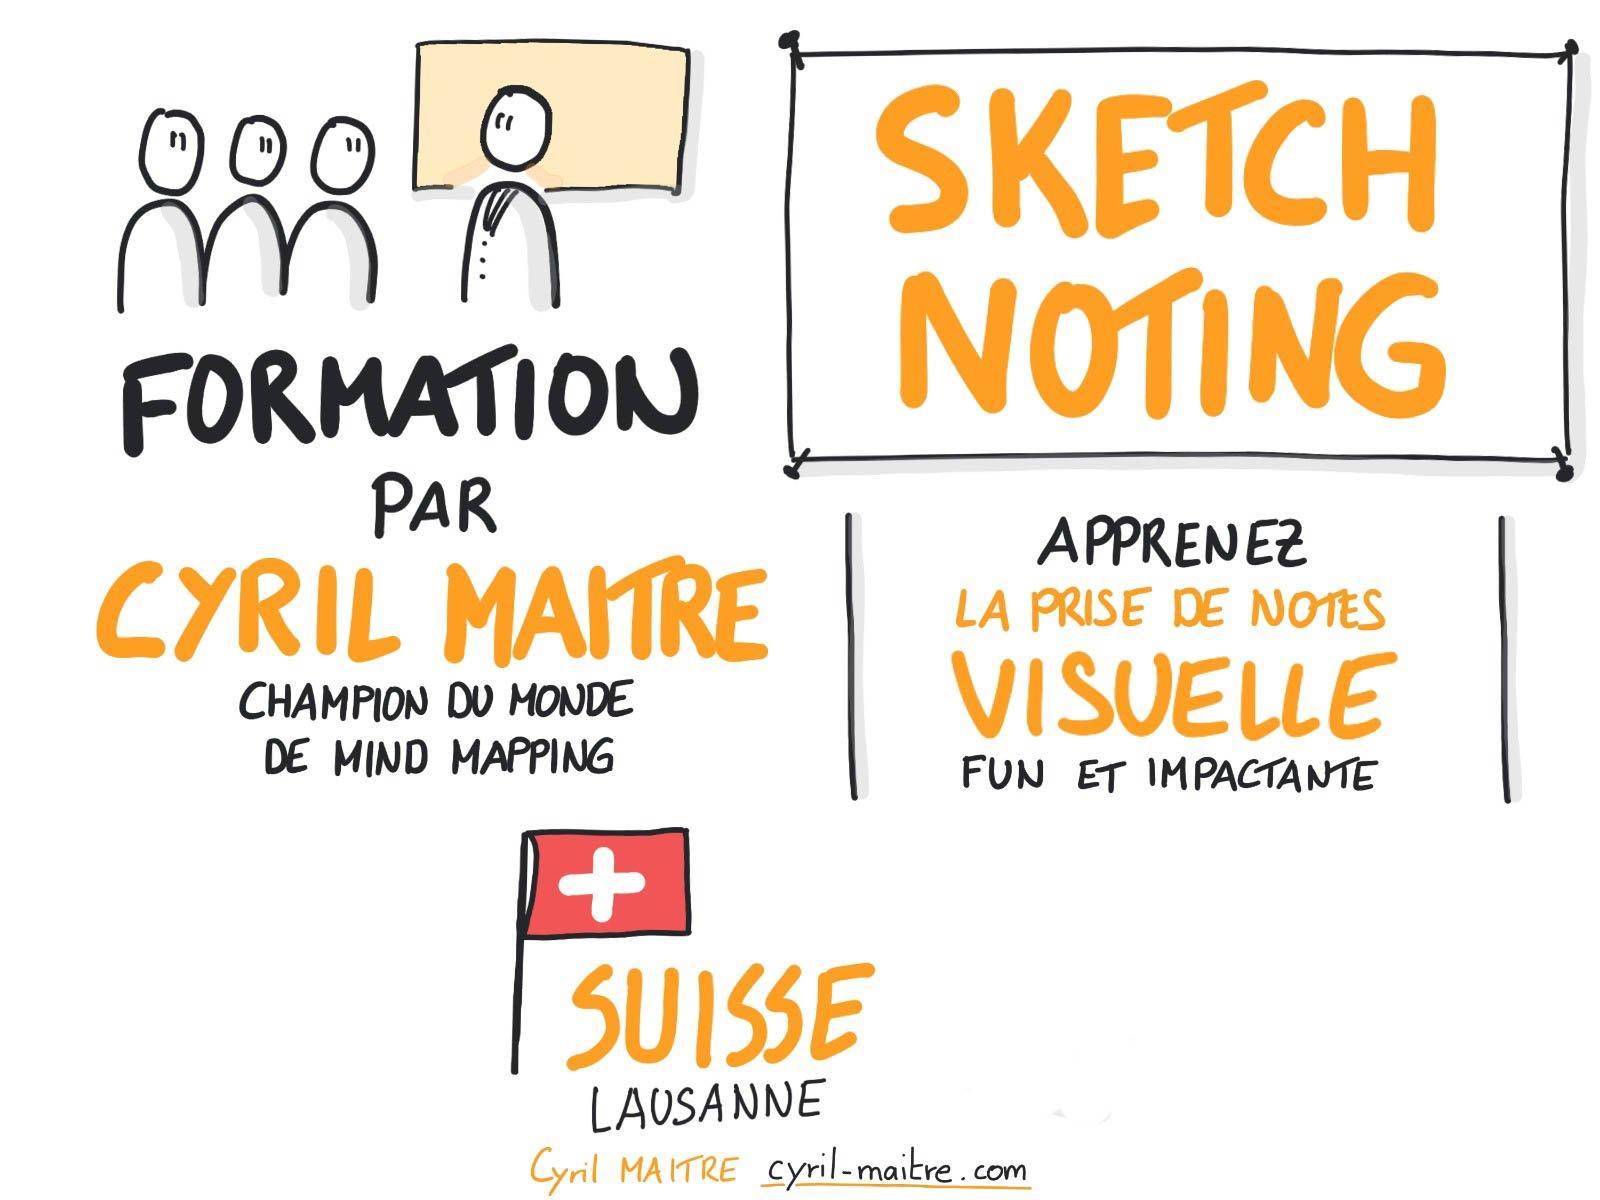 formation sketchnoting suisse